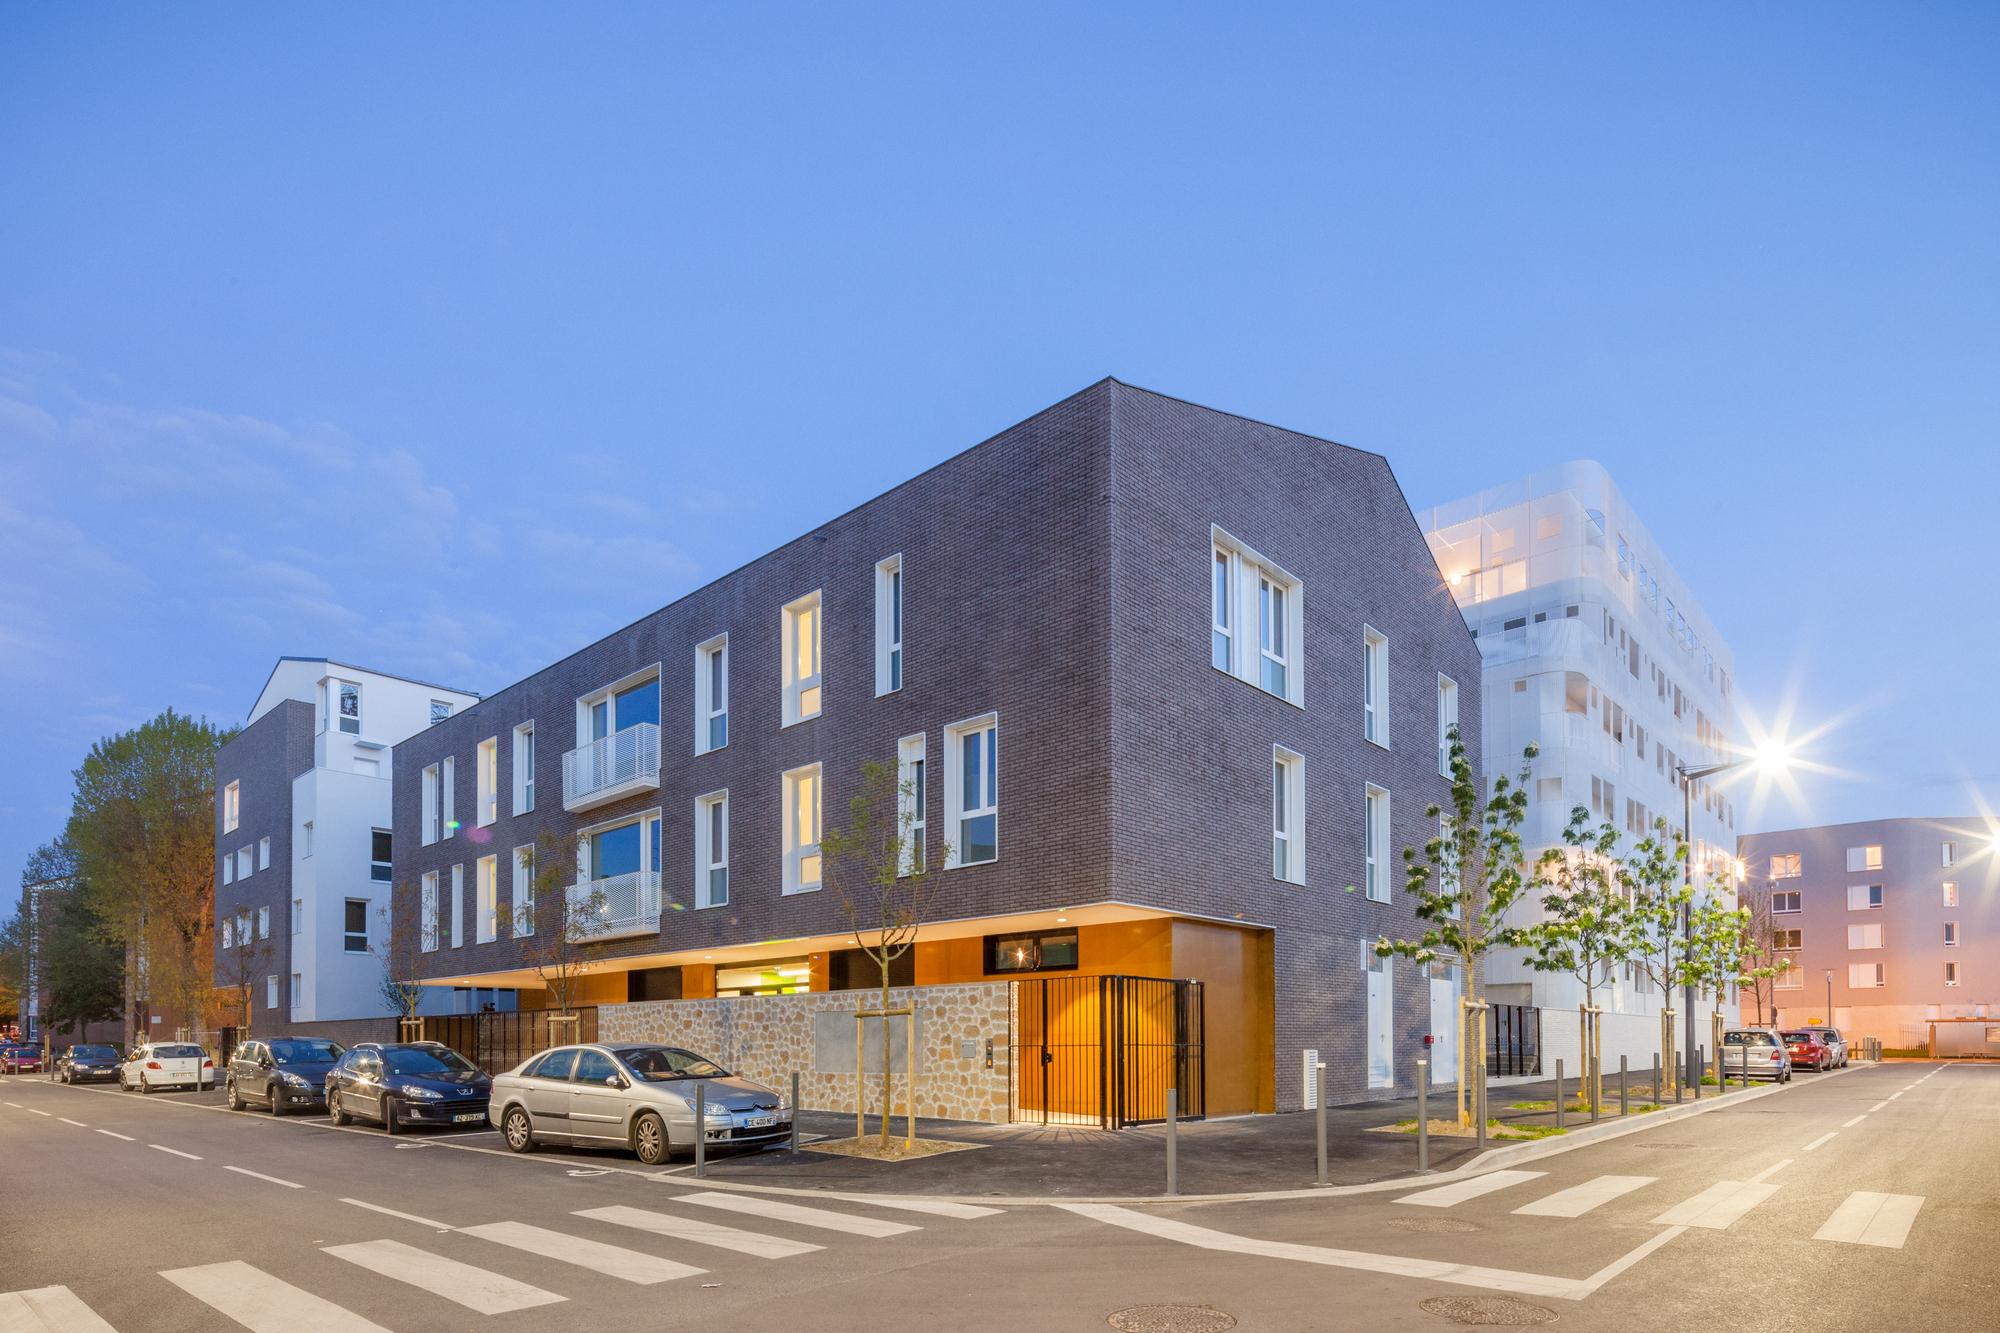 gallery of vigneux sur seine housing margot duclot architectes associ s 10. Black Bedroom Furniture Sets. Home Design Ideas